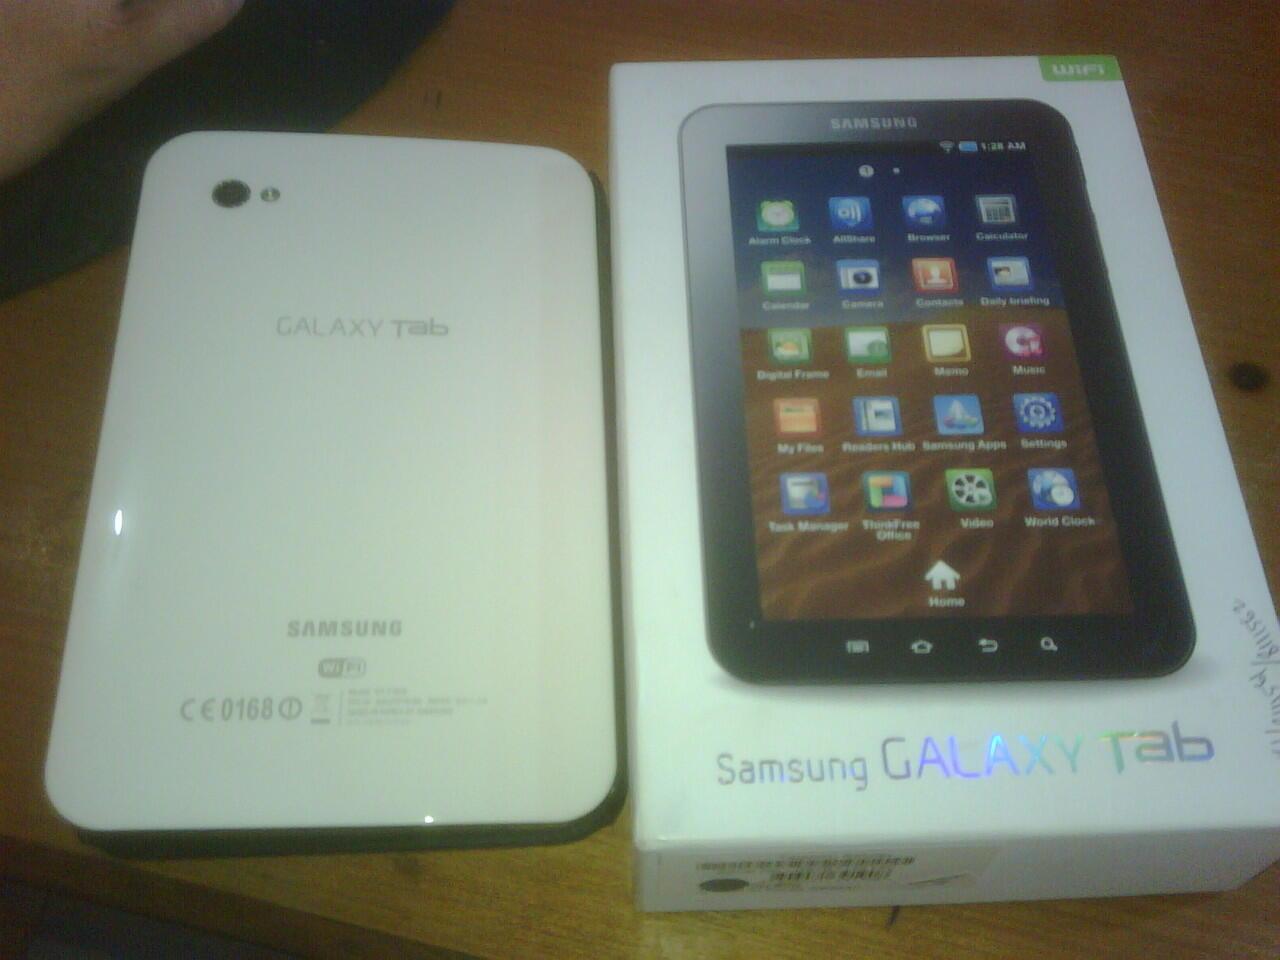 Samsung Galaxy Tab P1010 (WiFi Only) masih garansi + ZTE MF30